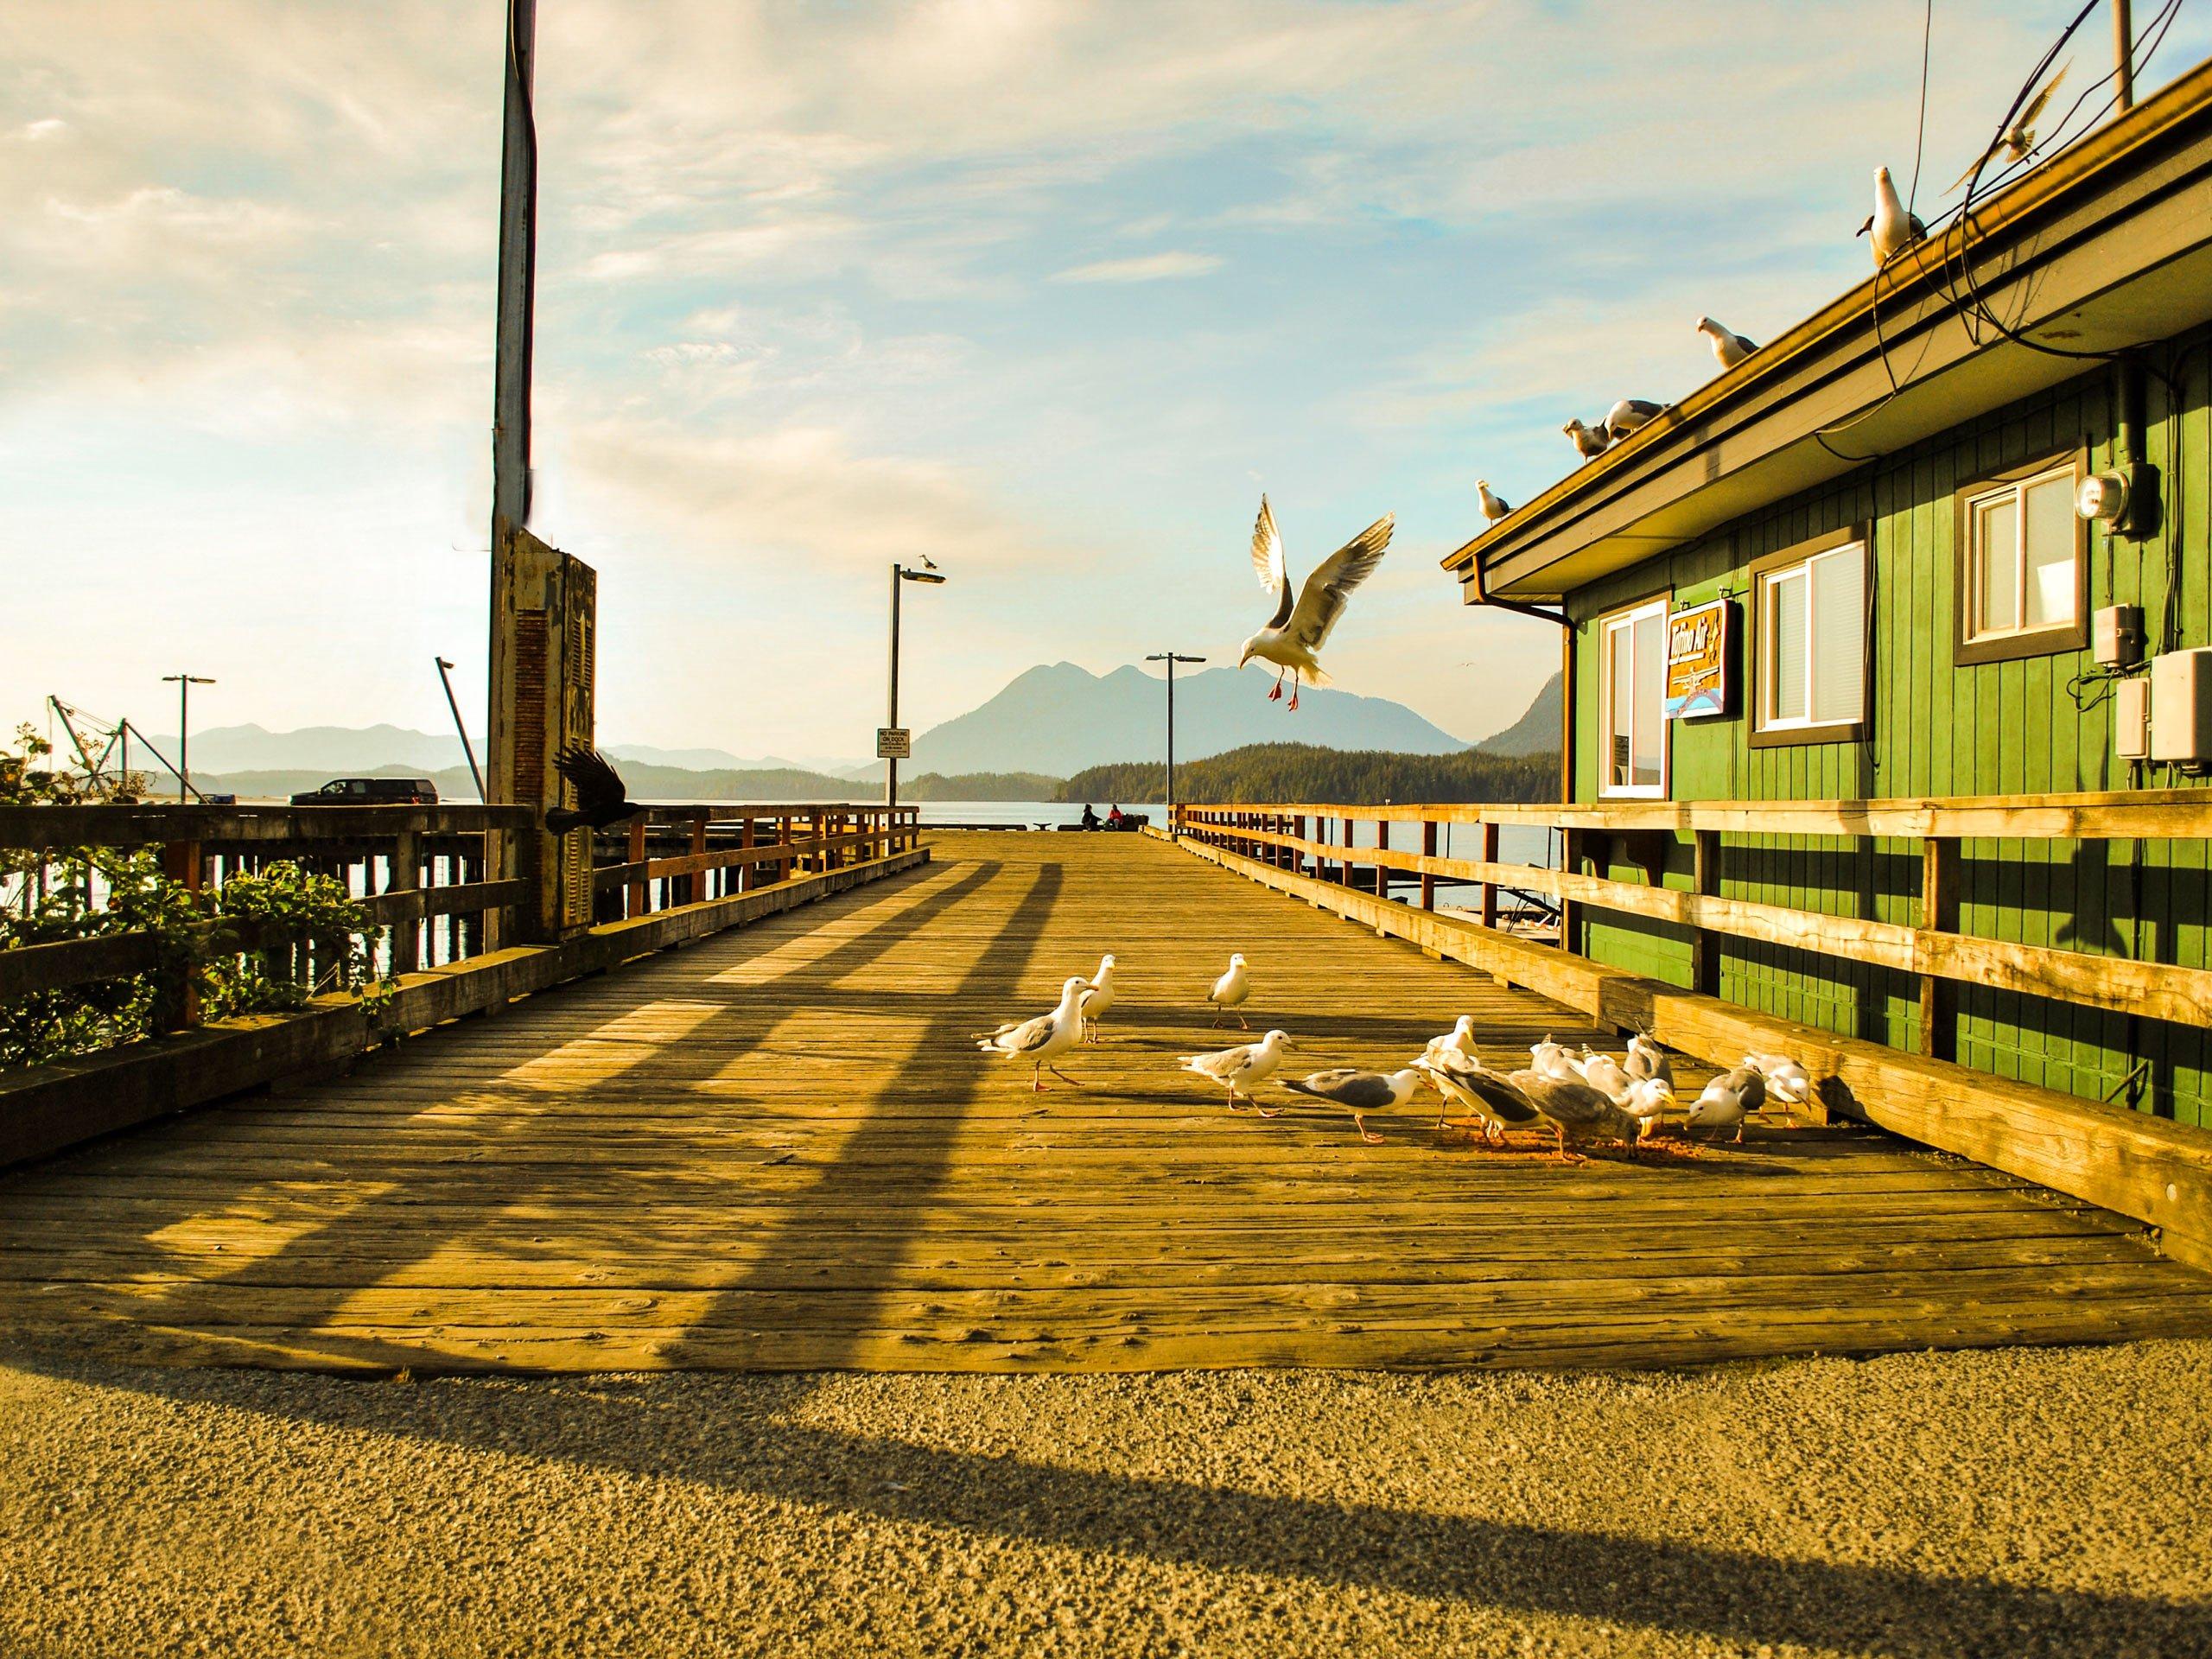 Seagulls on the pier in Tofino